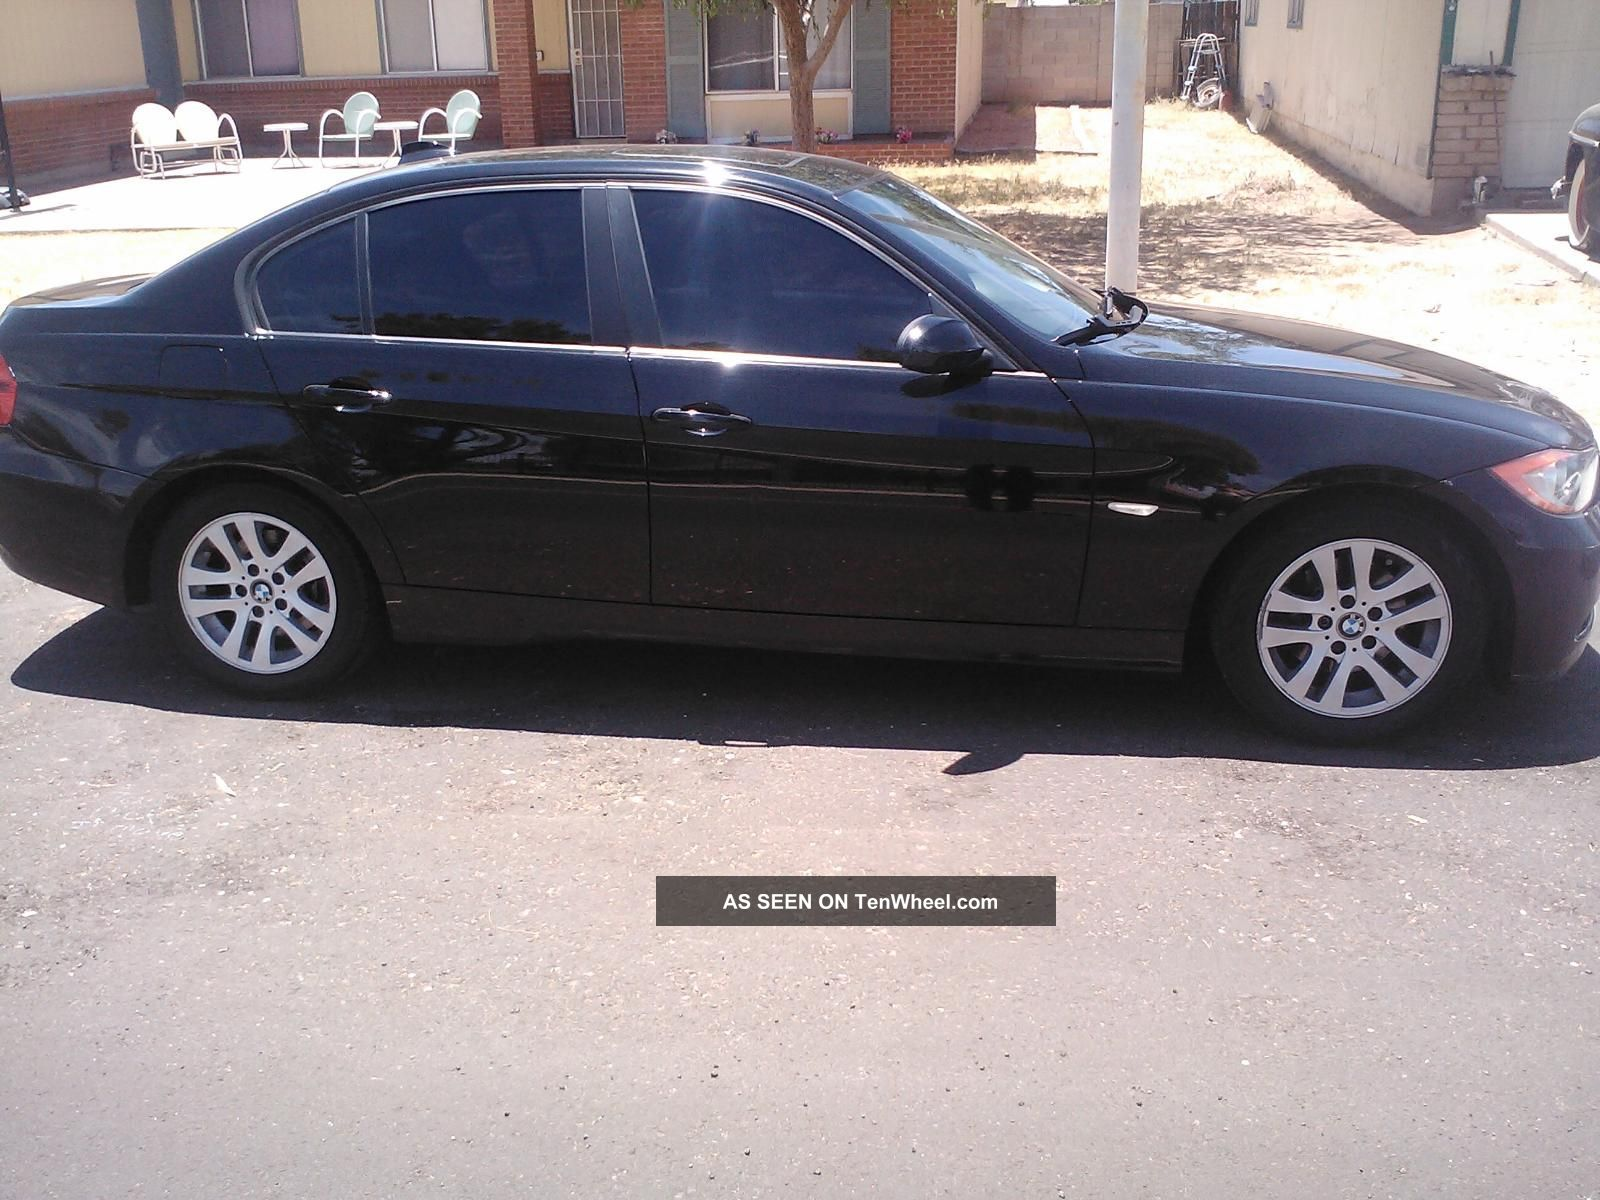 2007 Infiniti M45 >> 2007 328i Bmw 4 Door Sedan Black Inside And Out